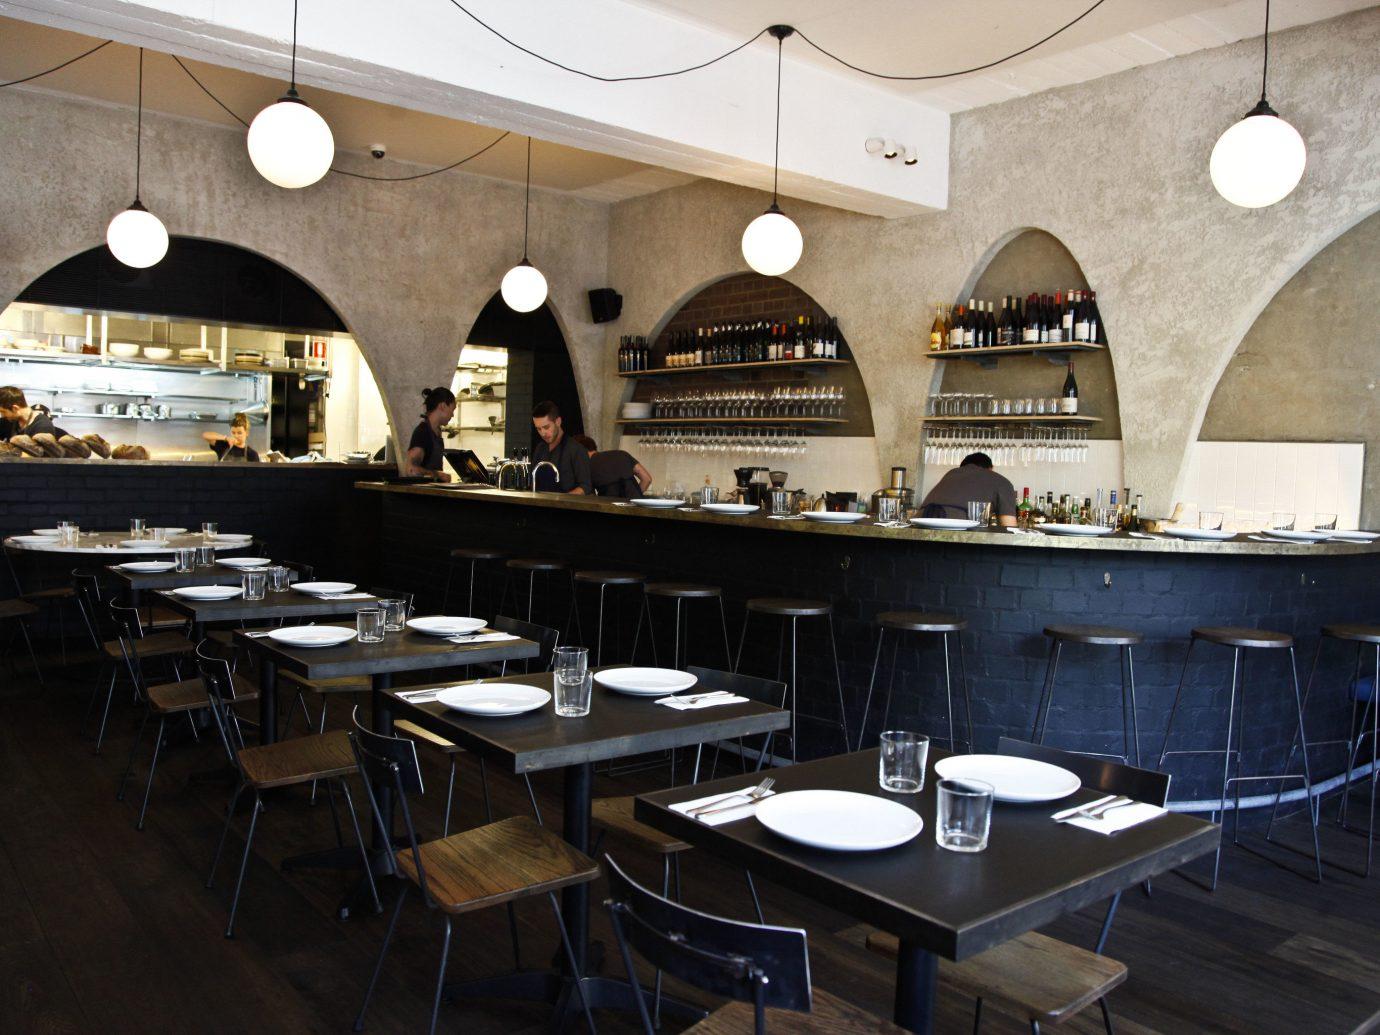 Trip Ideas indoor floor table restaurant Bar interior design meal café cafeteria cooking